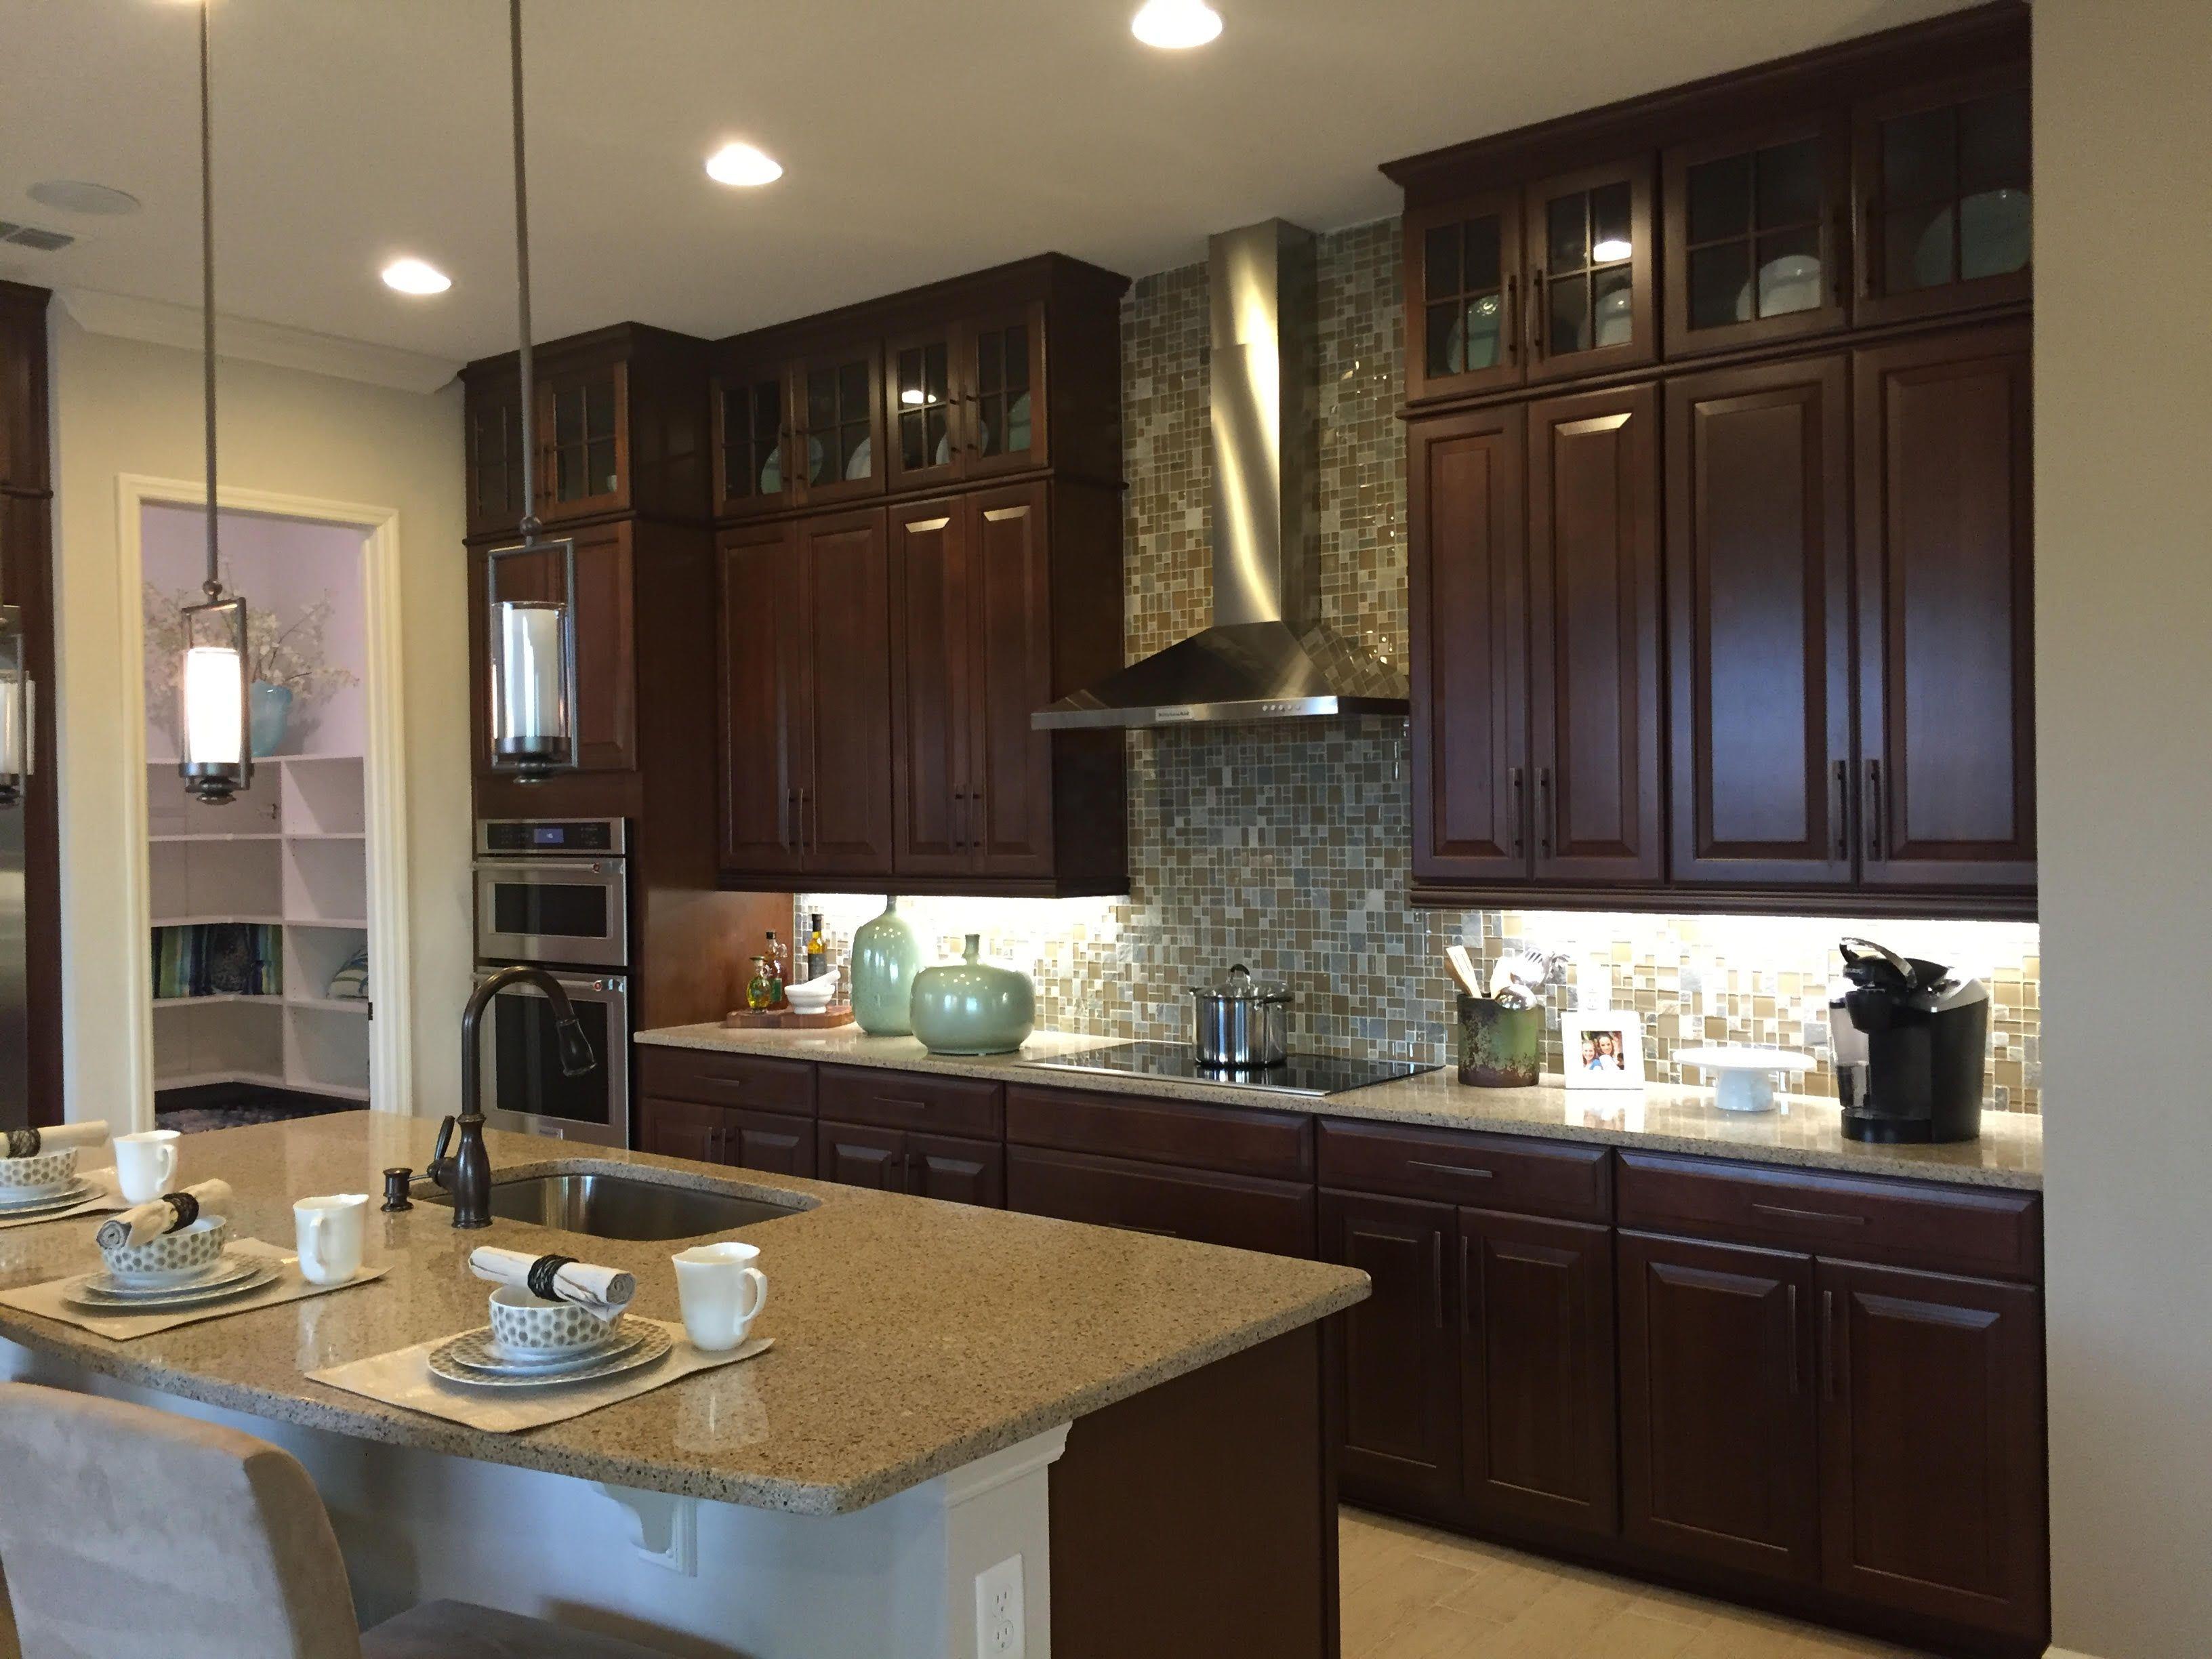 Watermark | Meritage Homes | Winter Garden, FL | New Construction ...